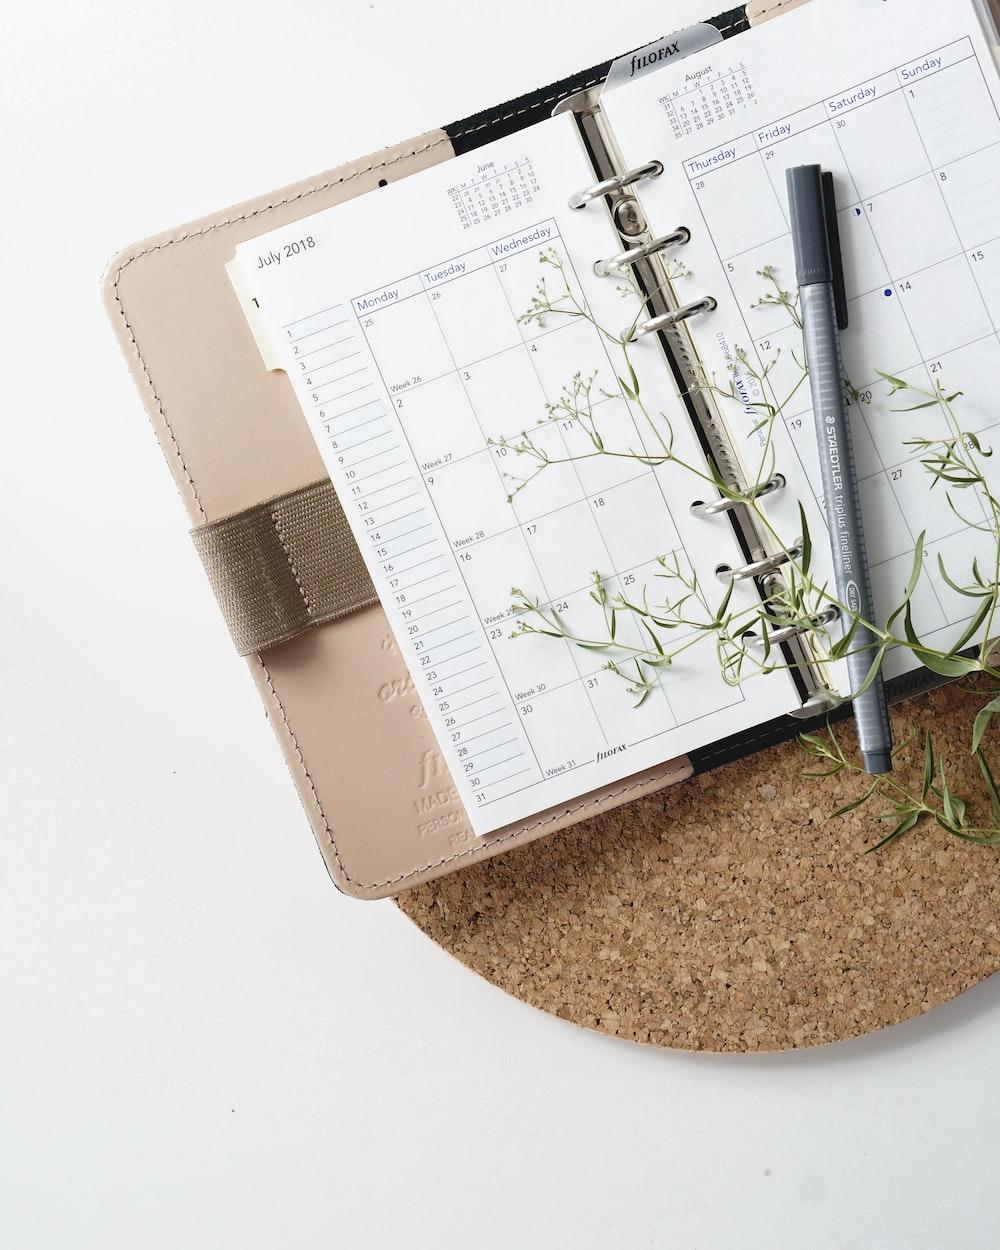 grey and black pen on calendar book